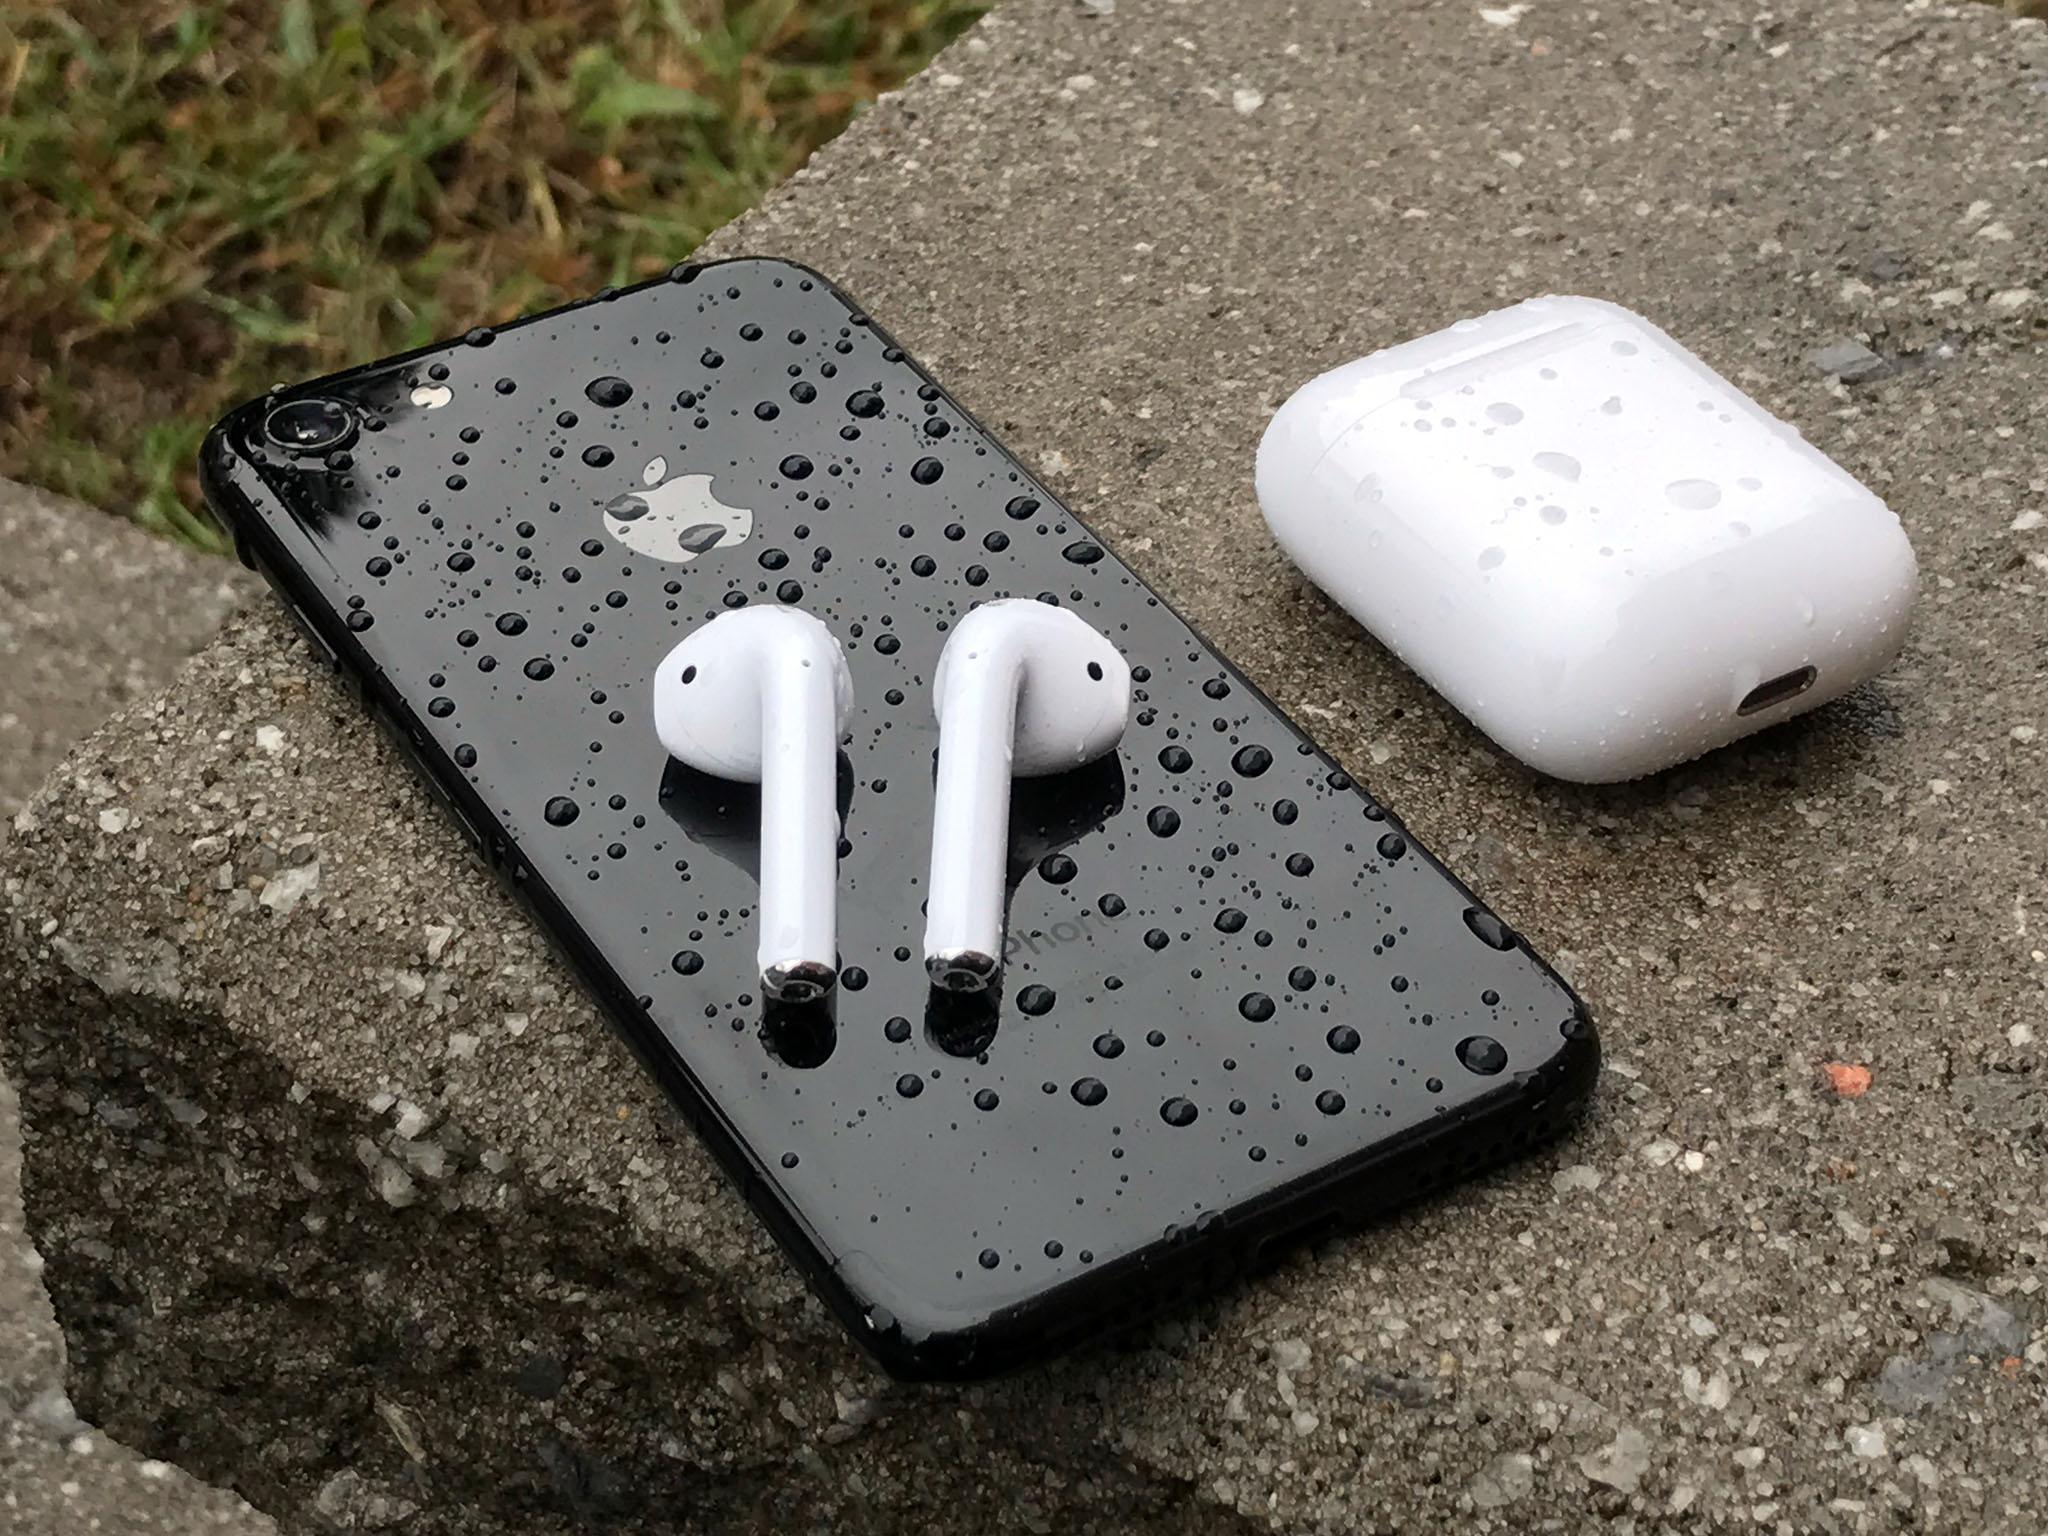 airpods-iphone-7-rain.jpg